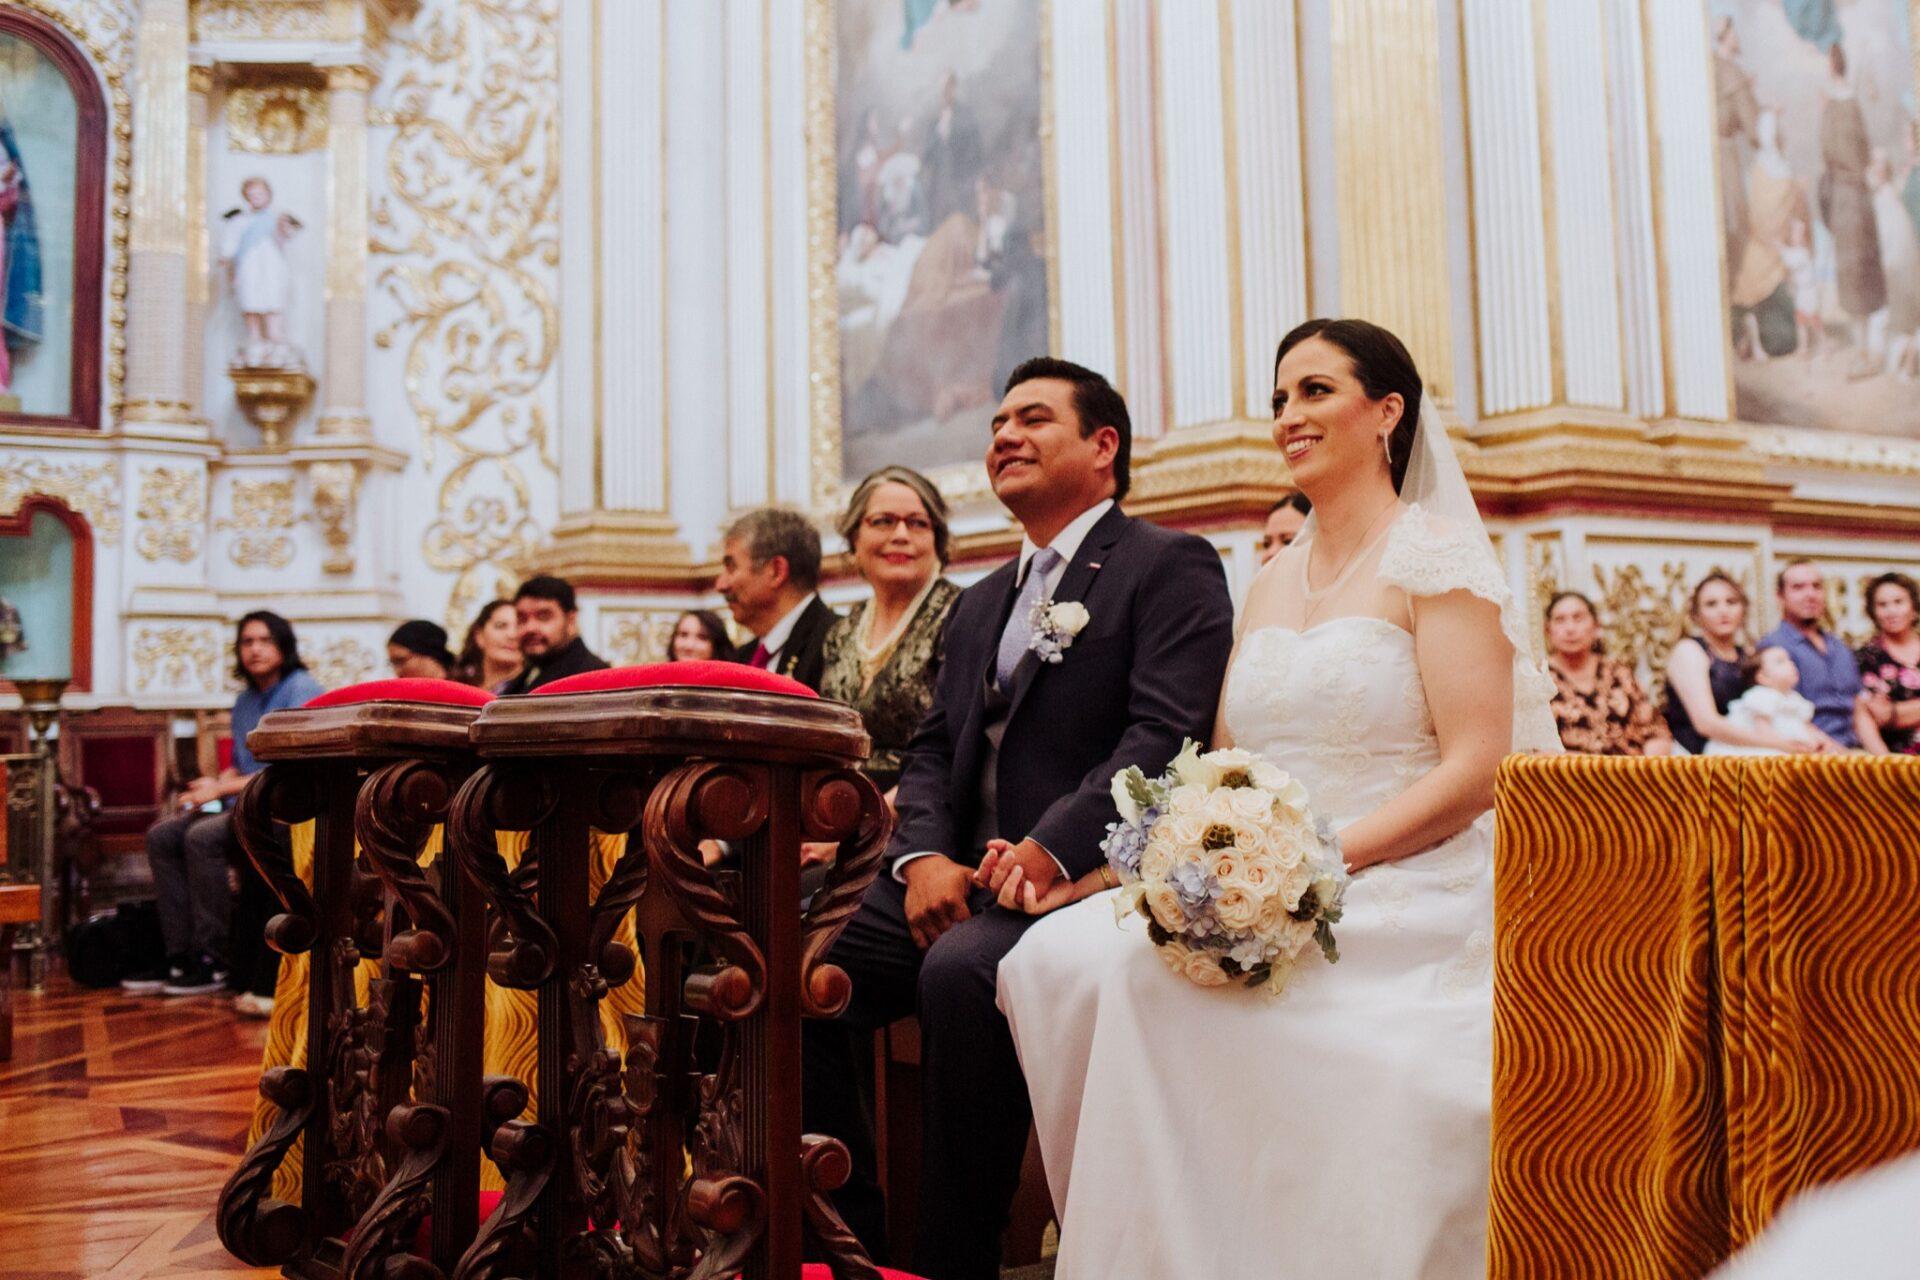 javier_noriega_fotografo_bodas_centro_platero_zacatecas_wedding_photographer10